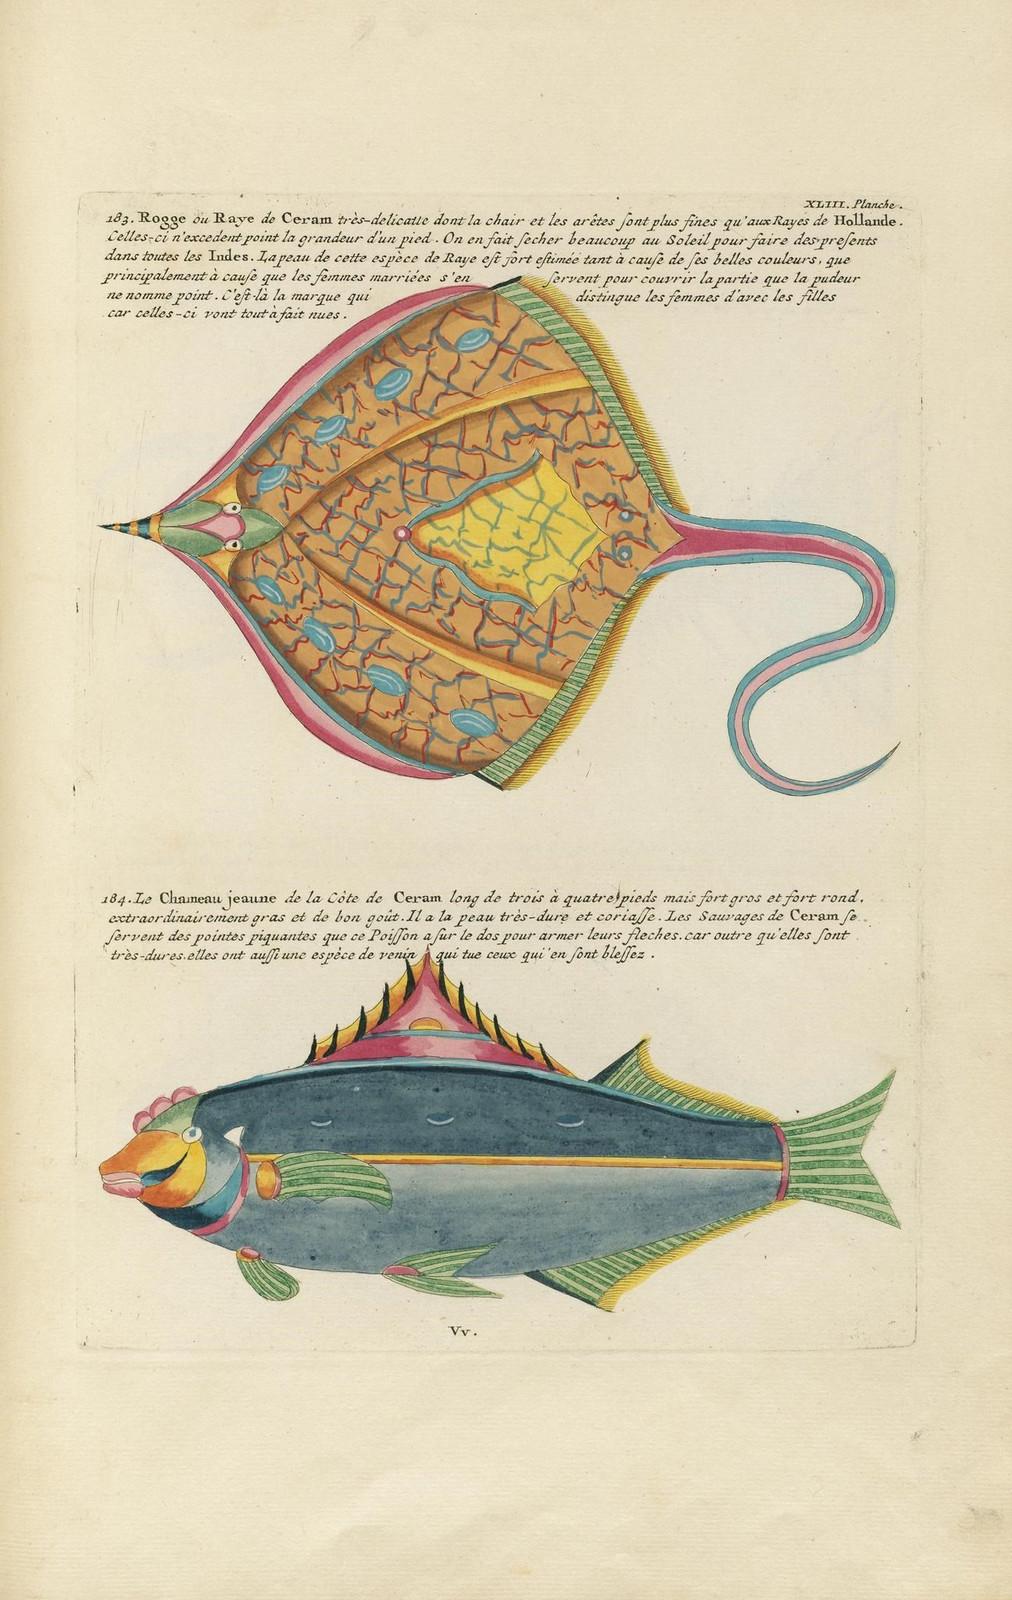 Louis Renard poissons 4